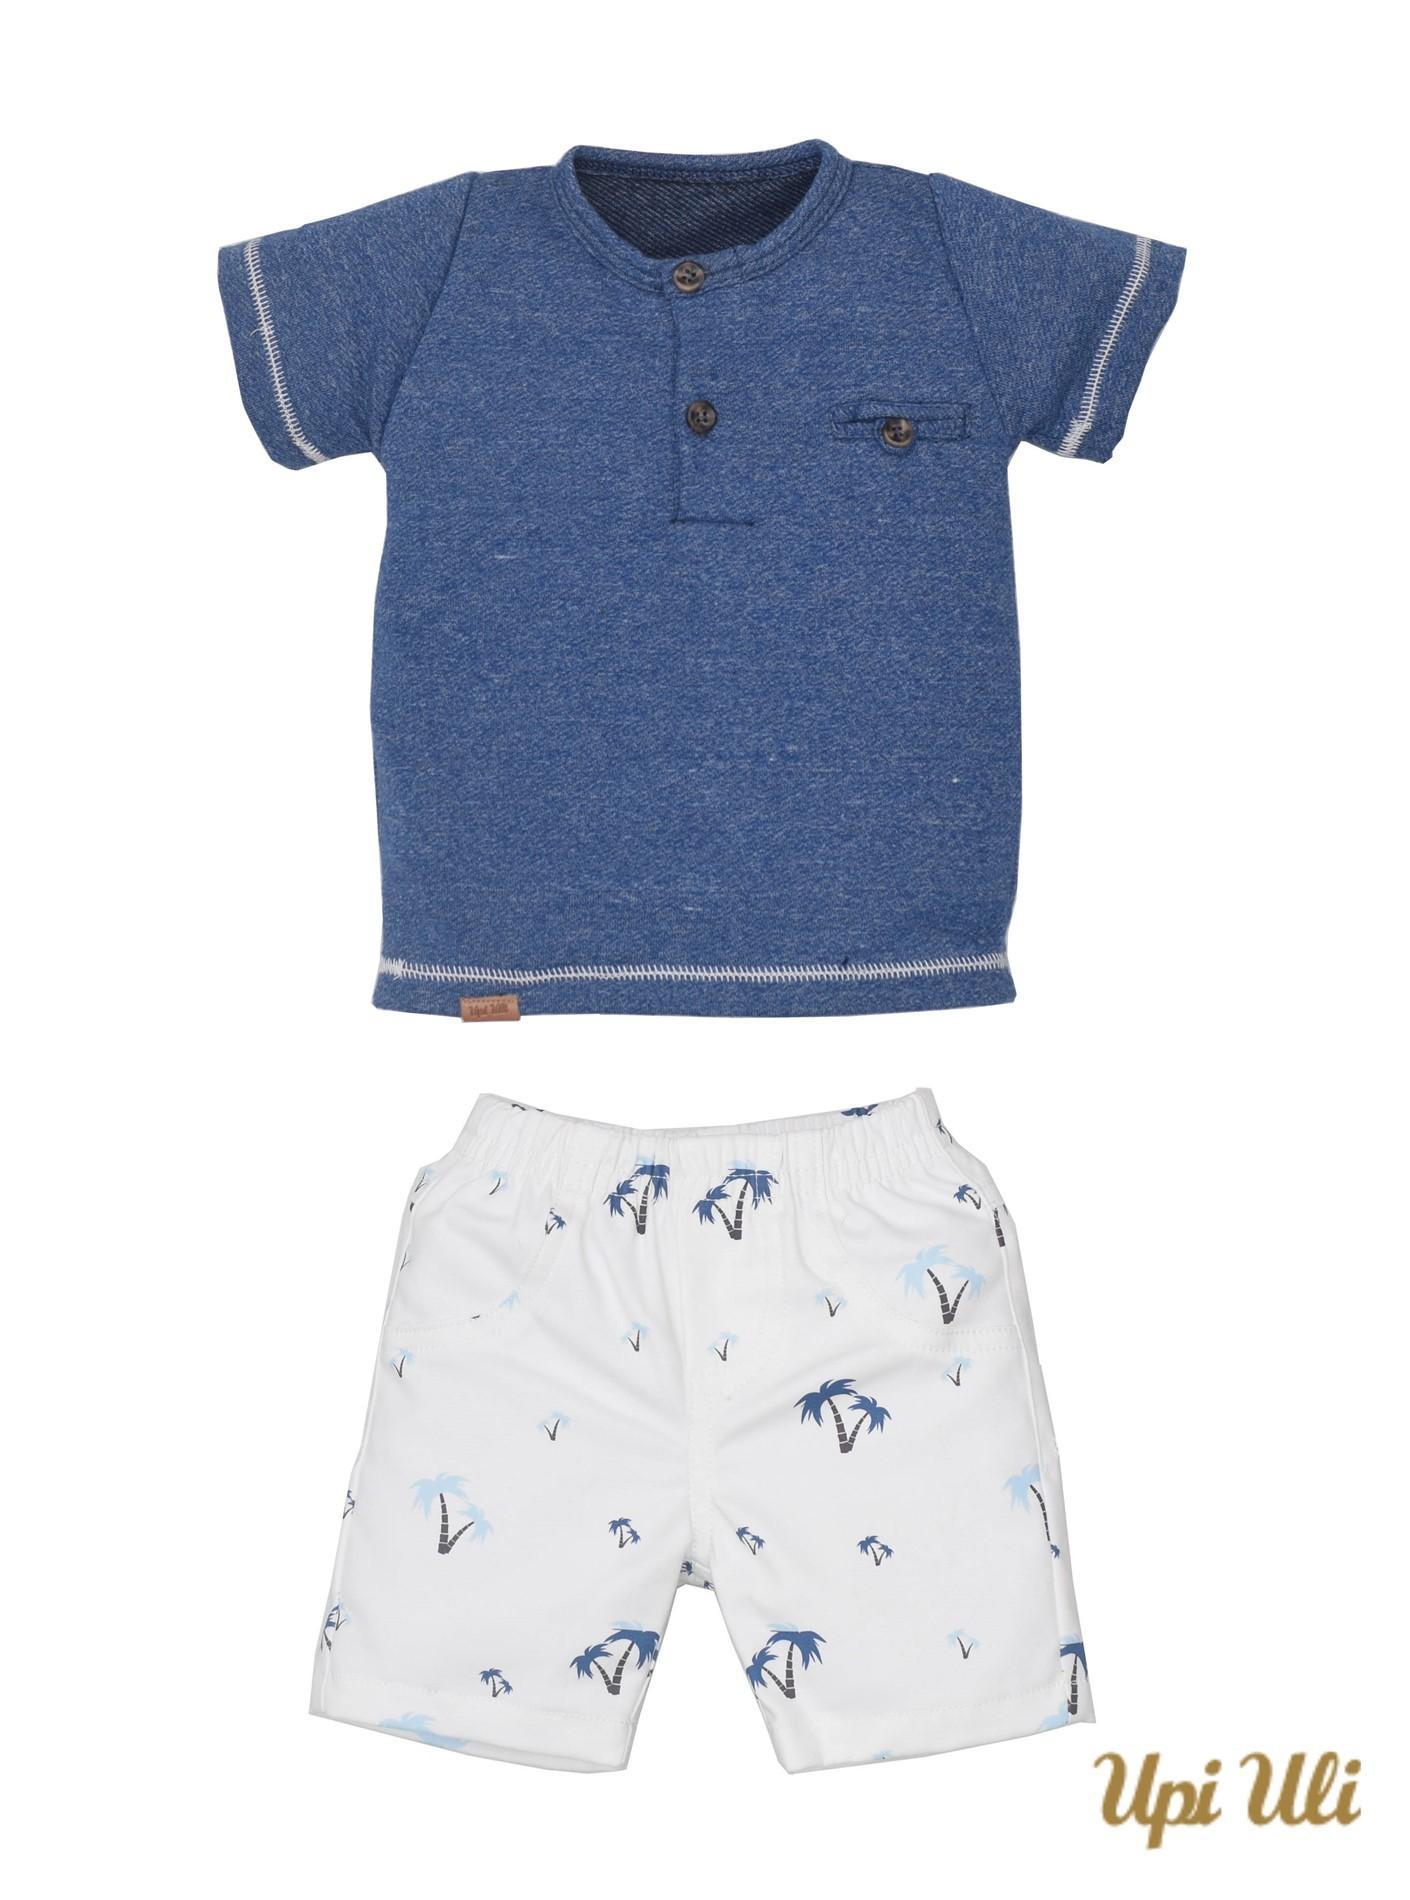 Conj. T-Shirt Moletinho Mars/Compact Cott Span Hiago